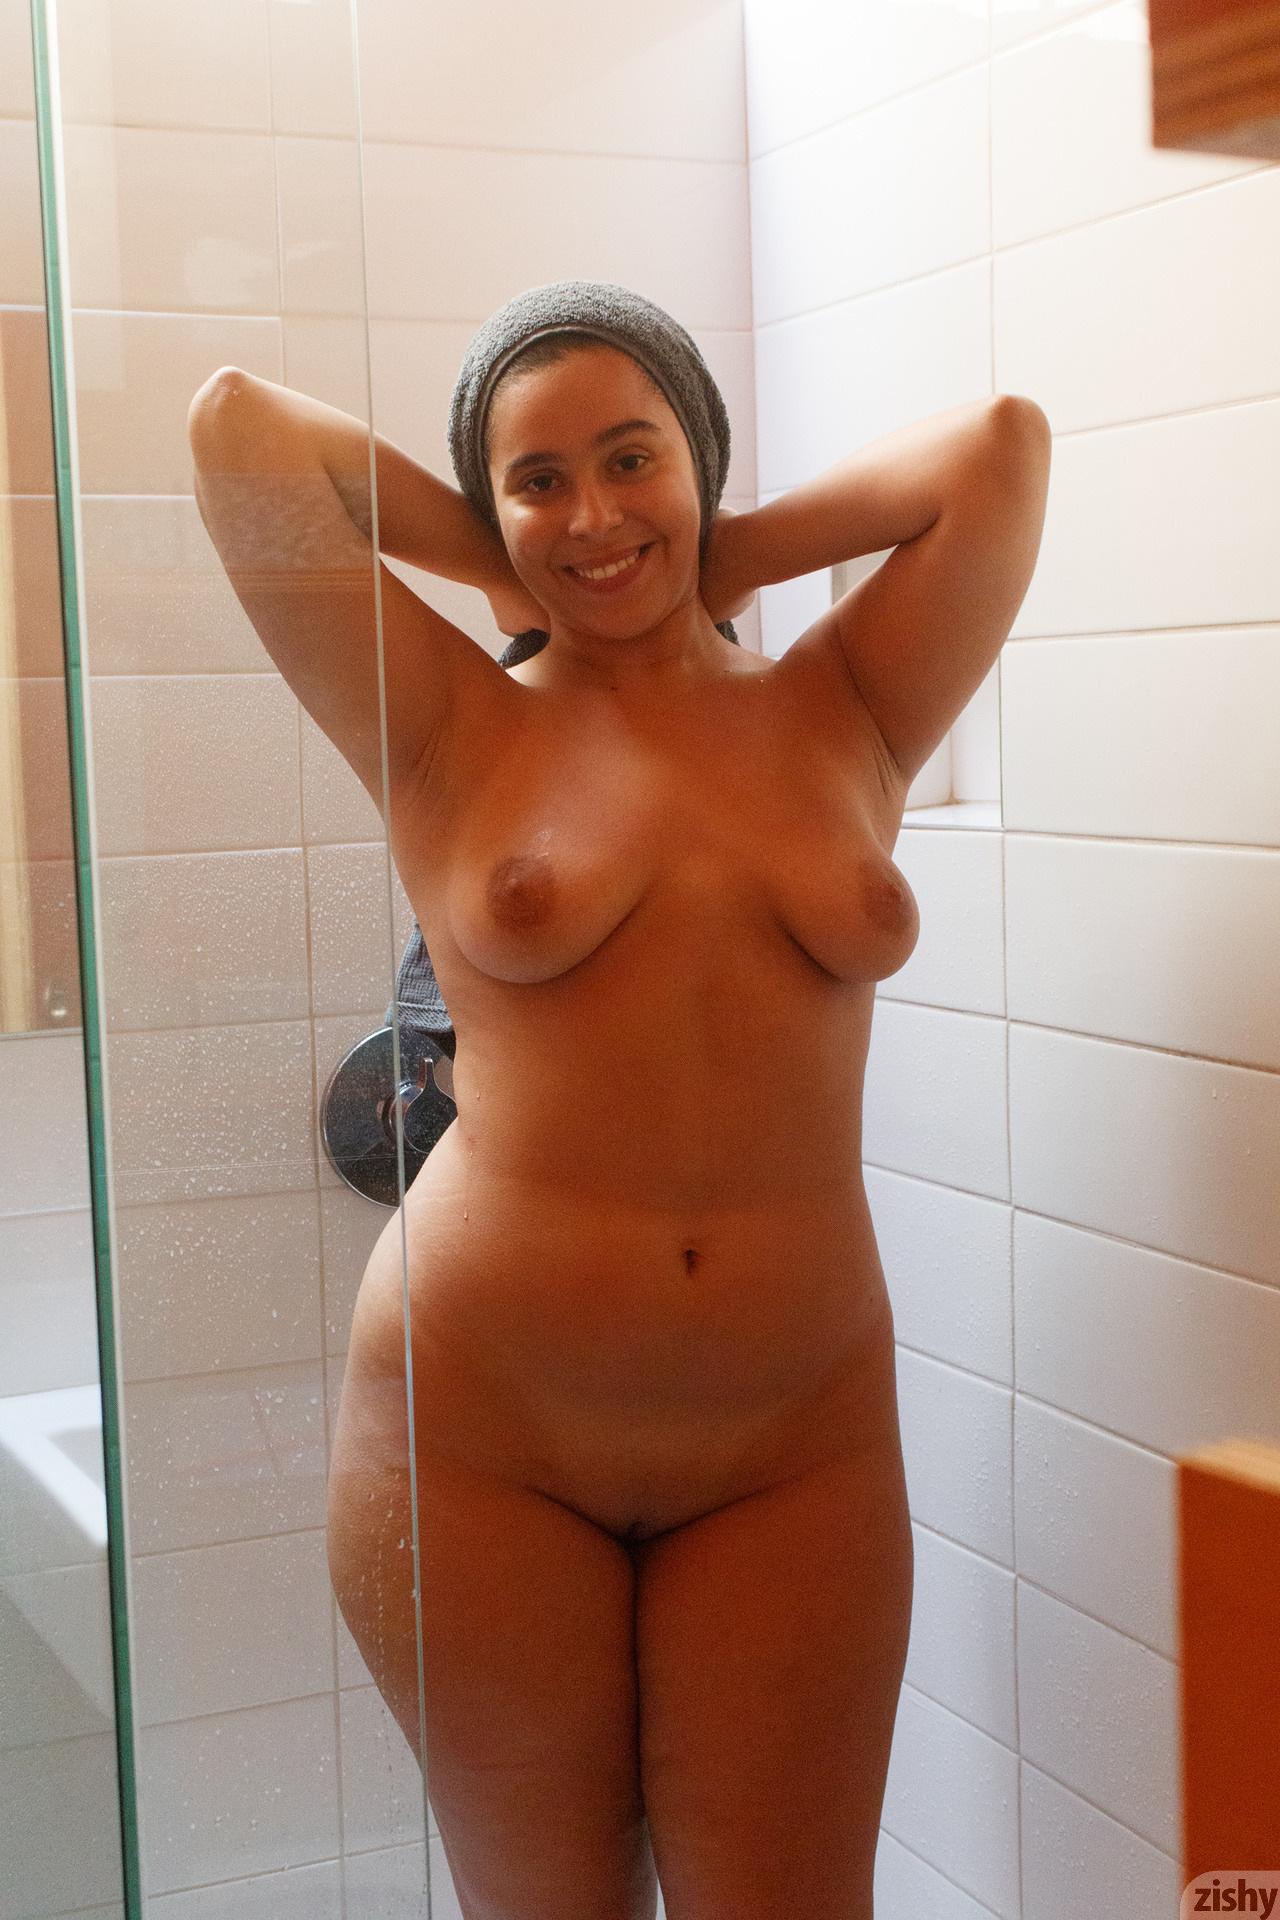 Full Body Nude Girl